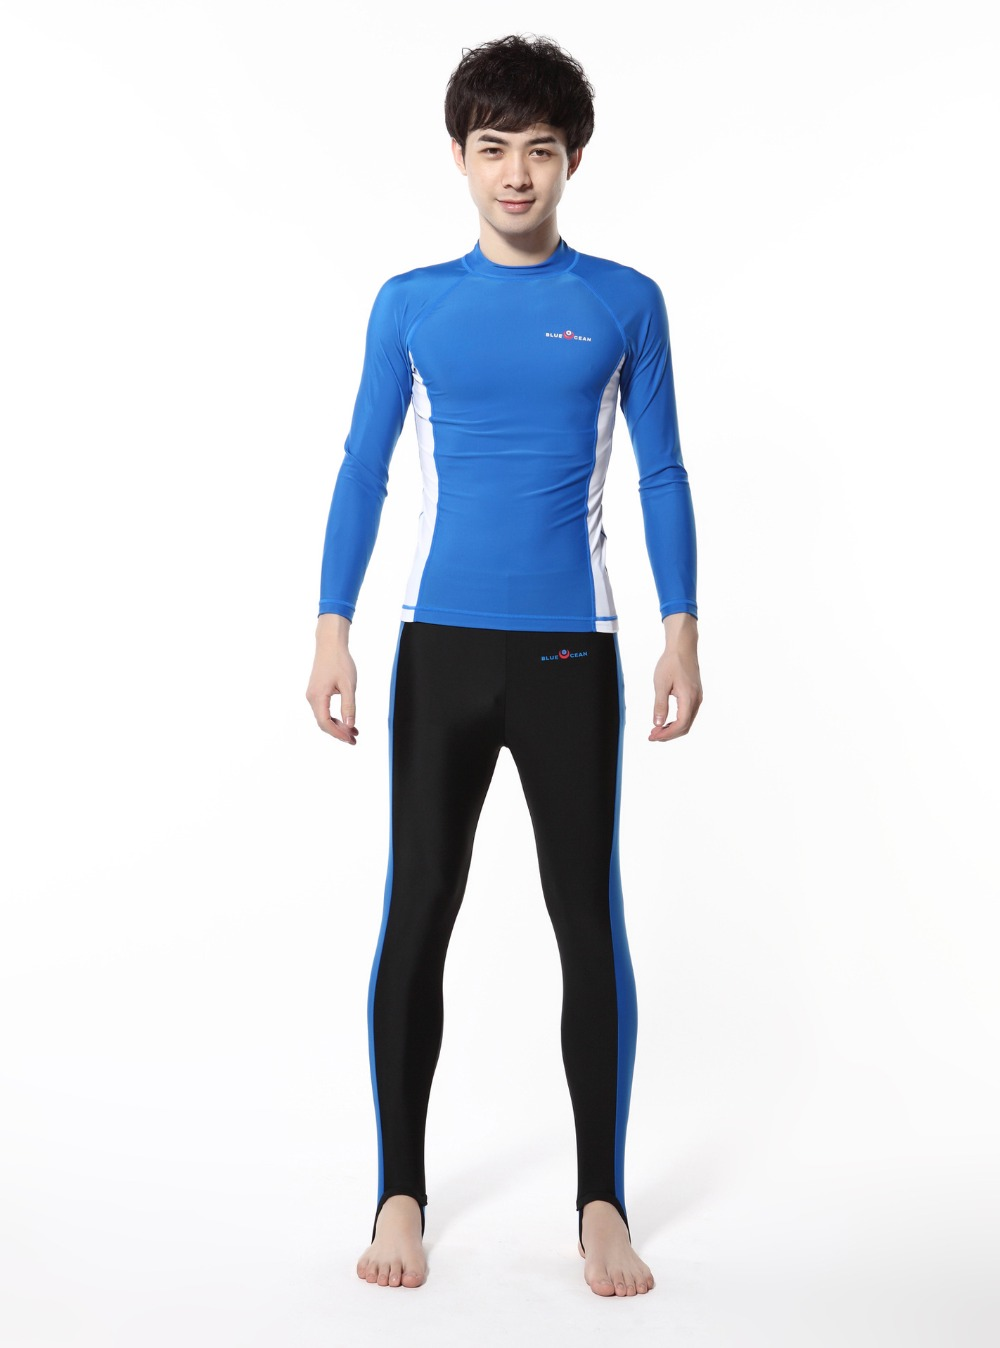 Women Surfing Swimsuit Rashguard font b Shirts b font Pants font b Men b font Water